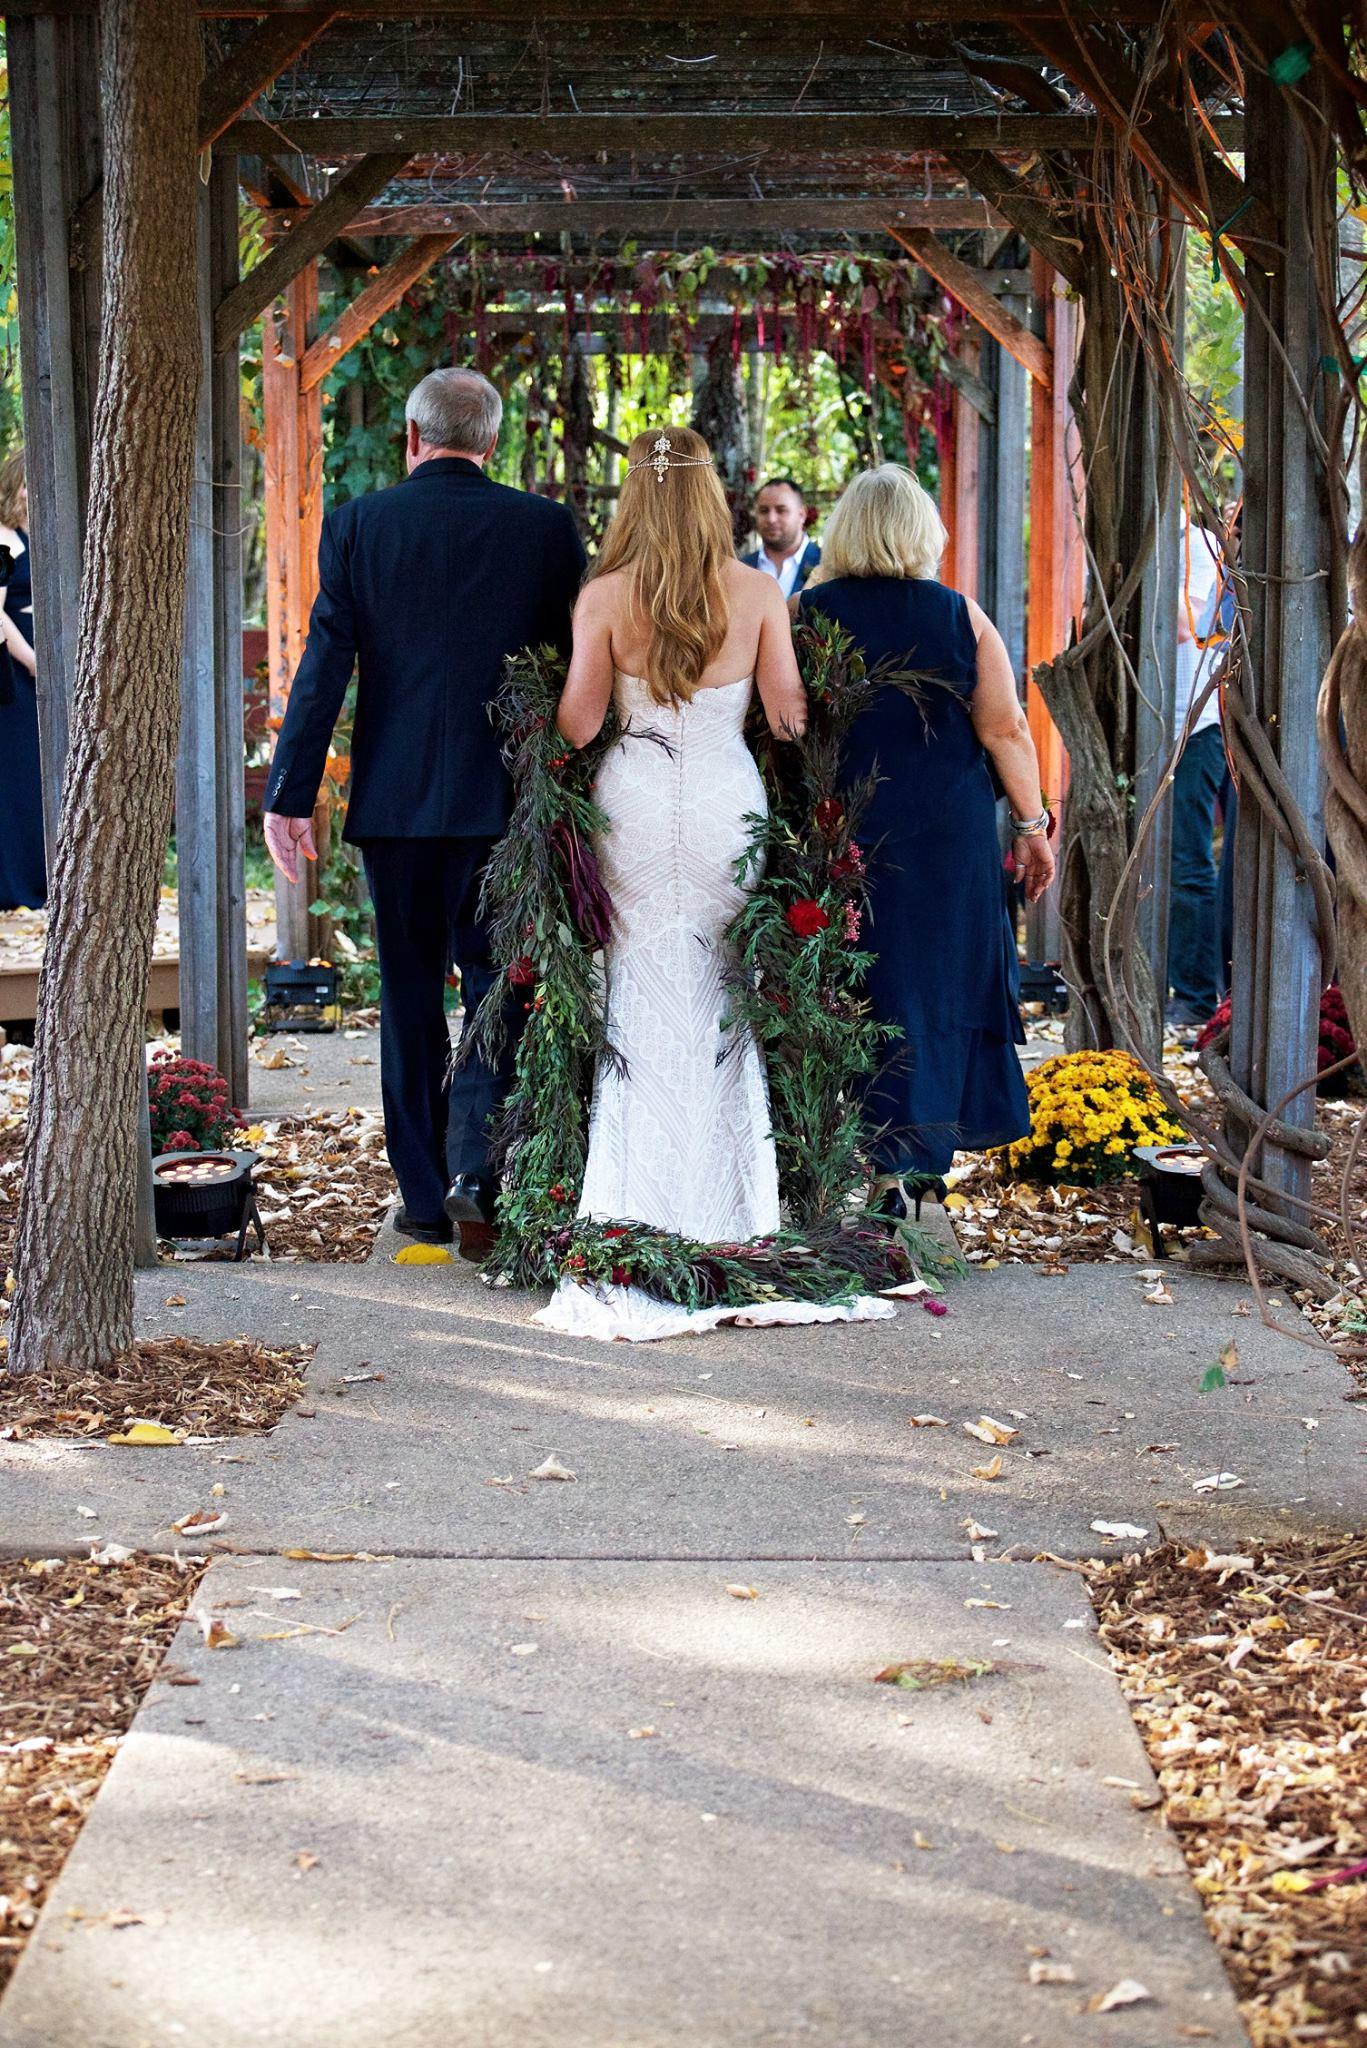 Use on wedding page 2.jpg